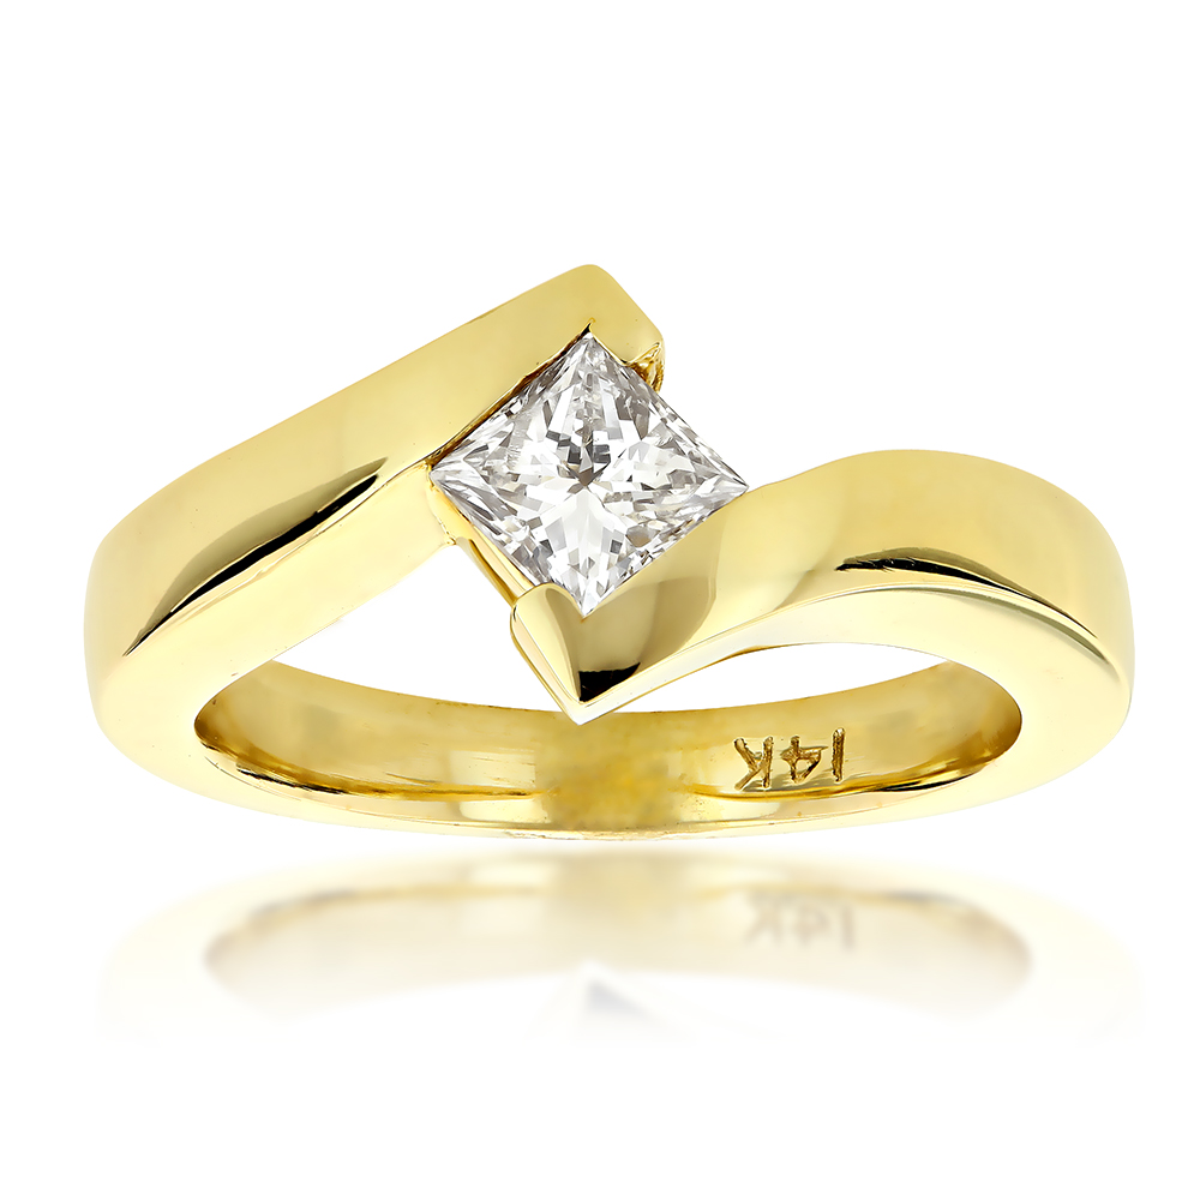 Classy Princess Cut Diamond Solitaire Engagement Ring 0.4ct 14k Gold